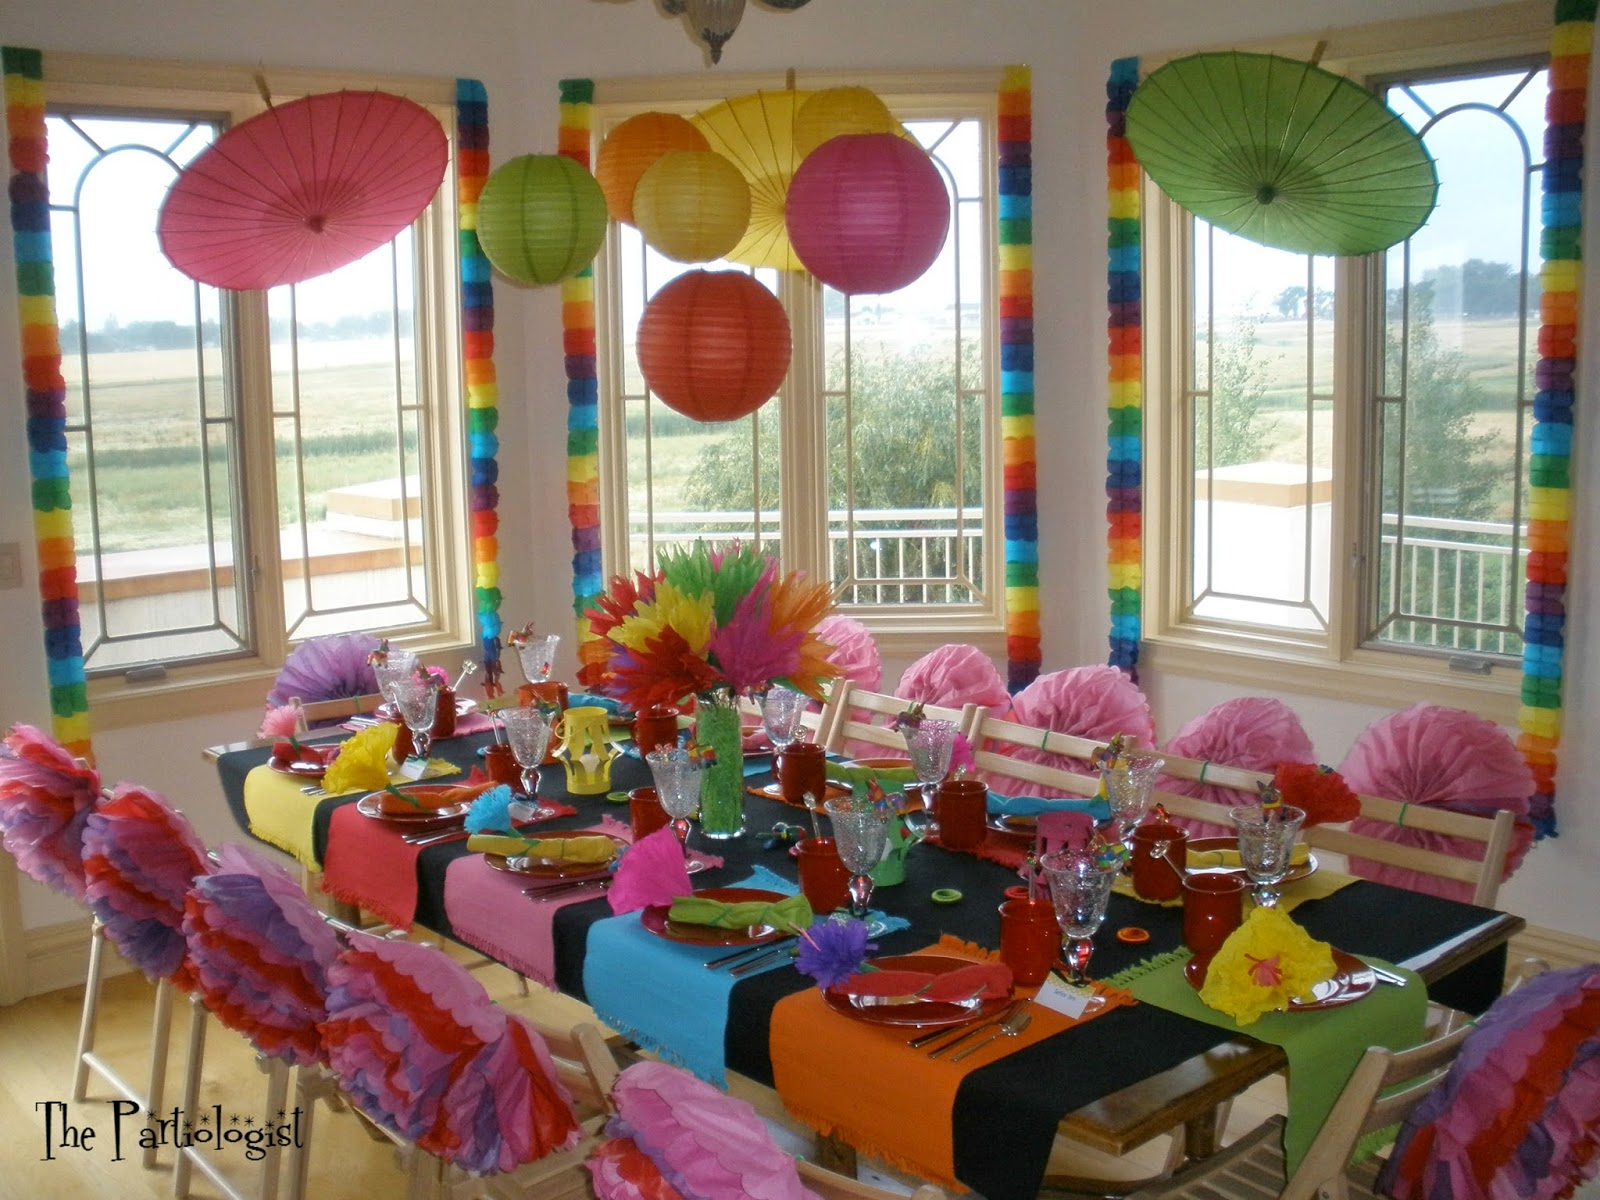 Fiesta table decorations ideas - Fiesta Part Ii